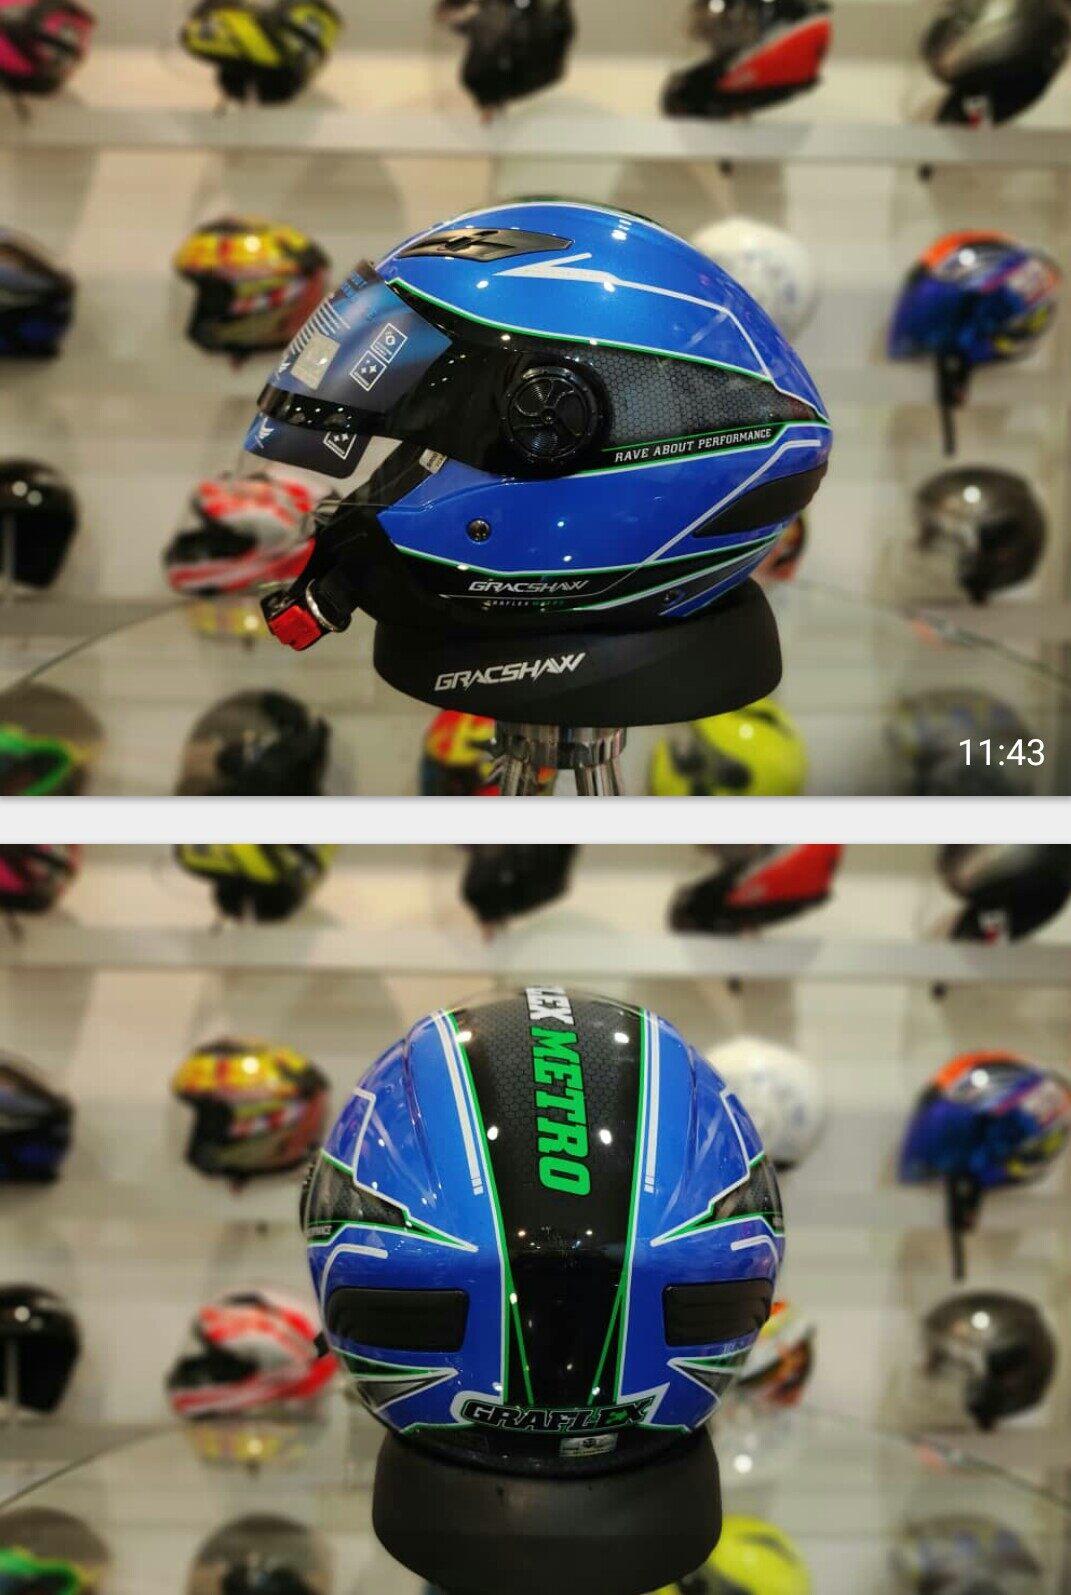 Gracshaw G666 Graflex Metro Double Visor Helmet